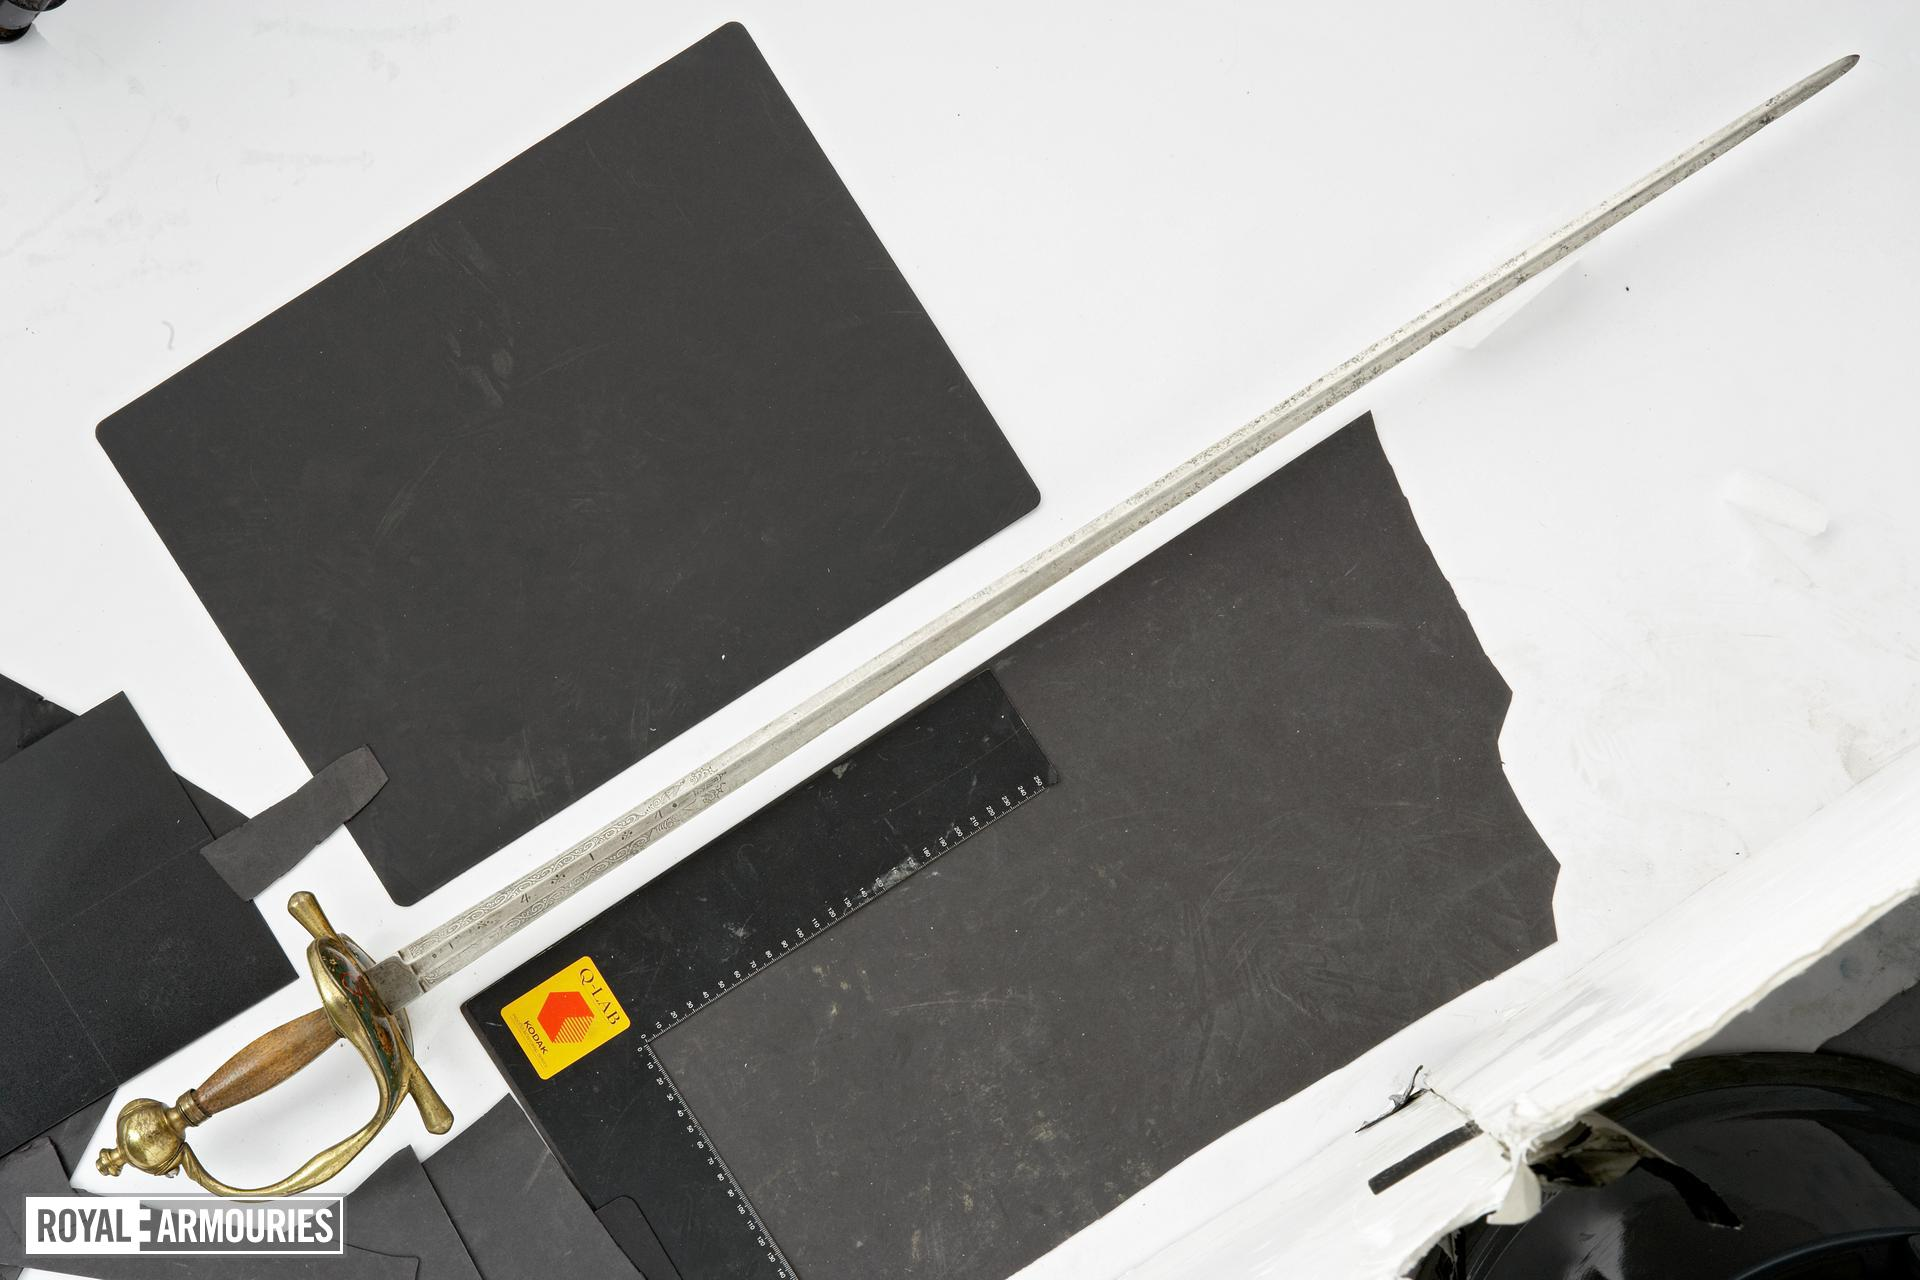 Sword Cavalry issue sword